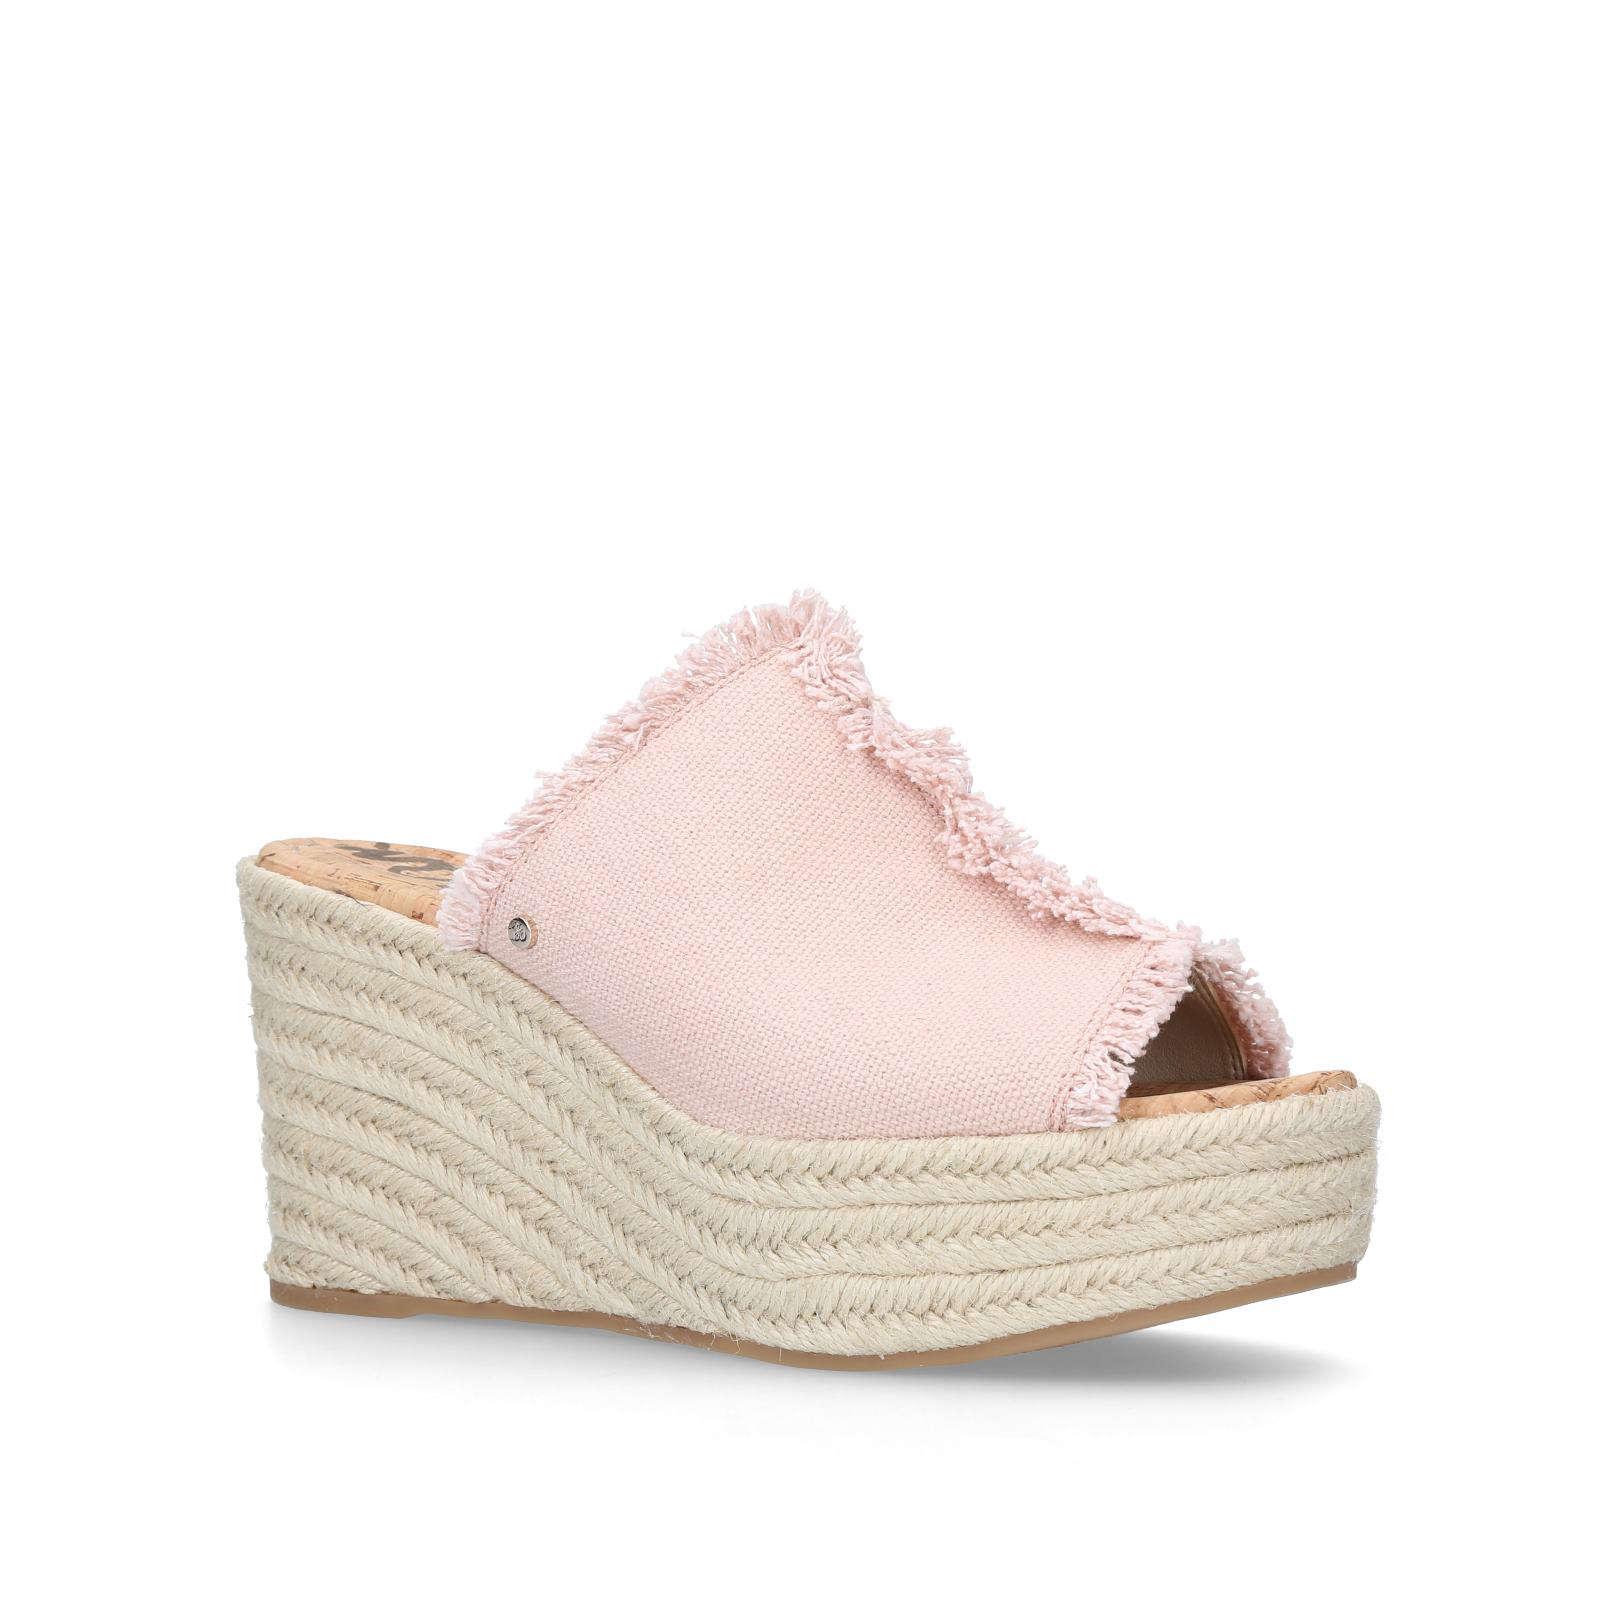 2439de42e50ffc DINA WEDGE 90 Dina Wedge 90 Sam-Edel Summer Pink Comb Mule by SAM ...